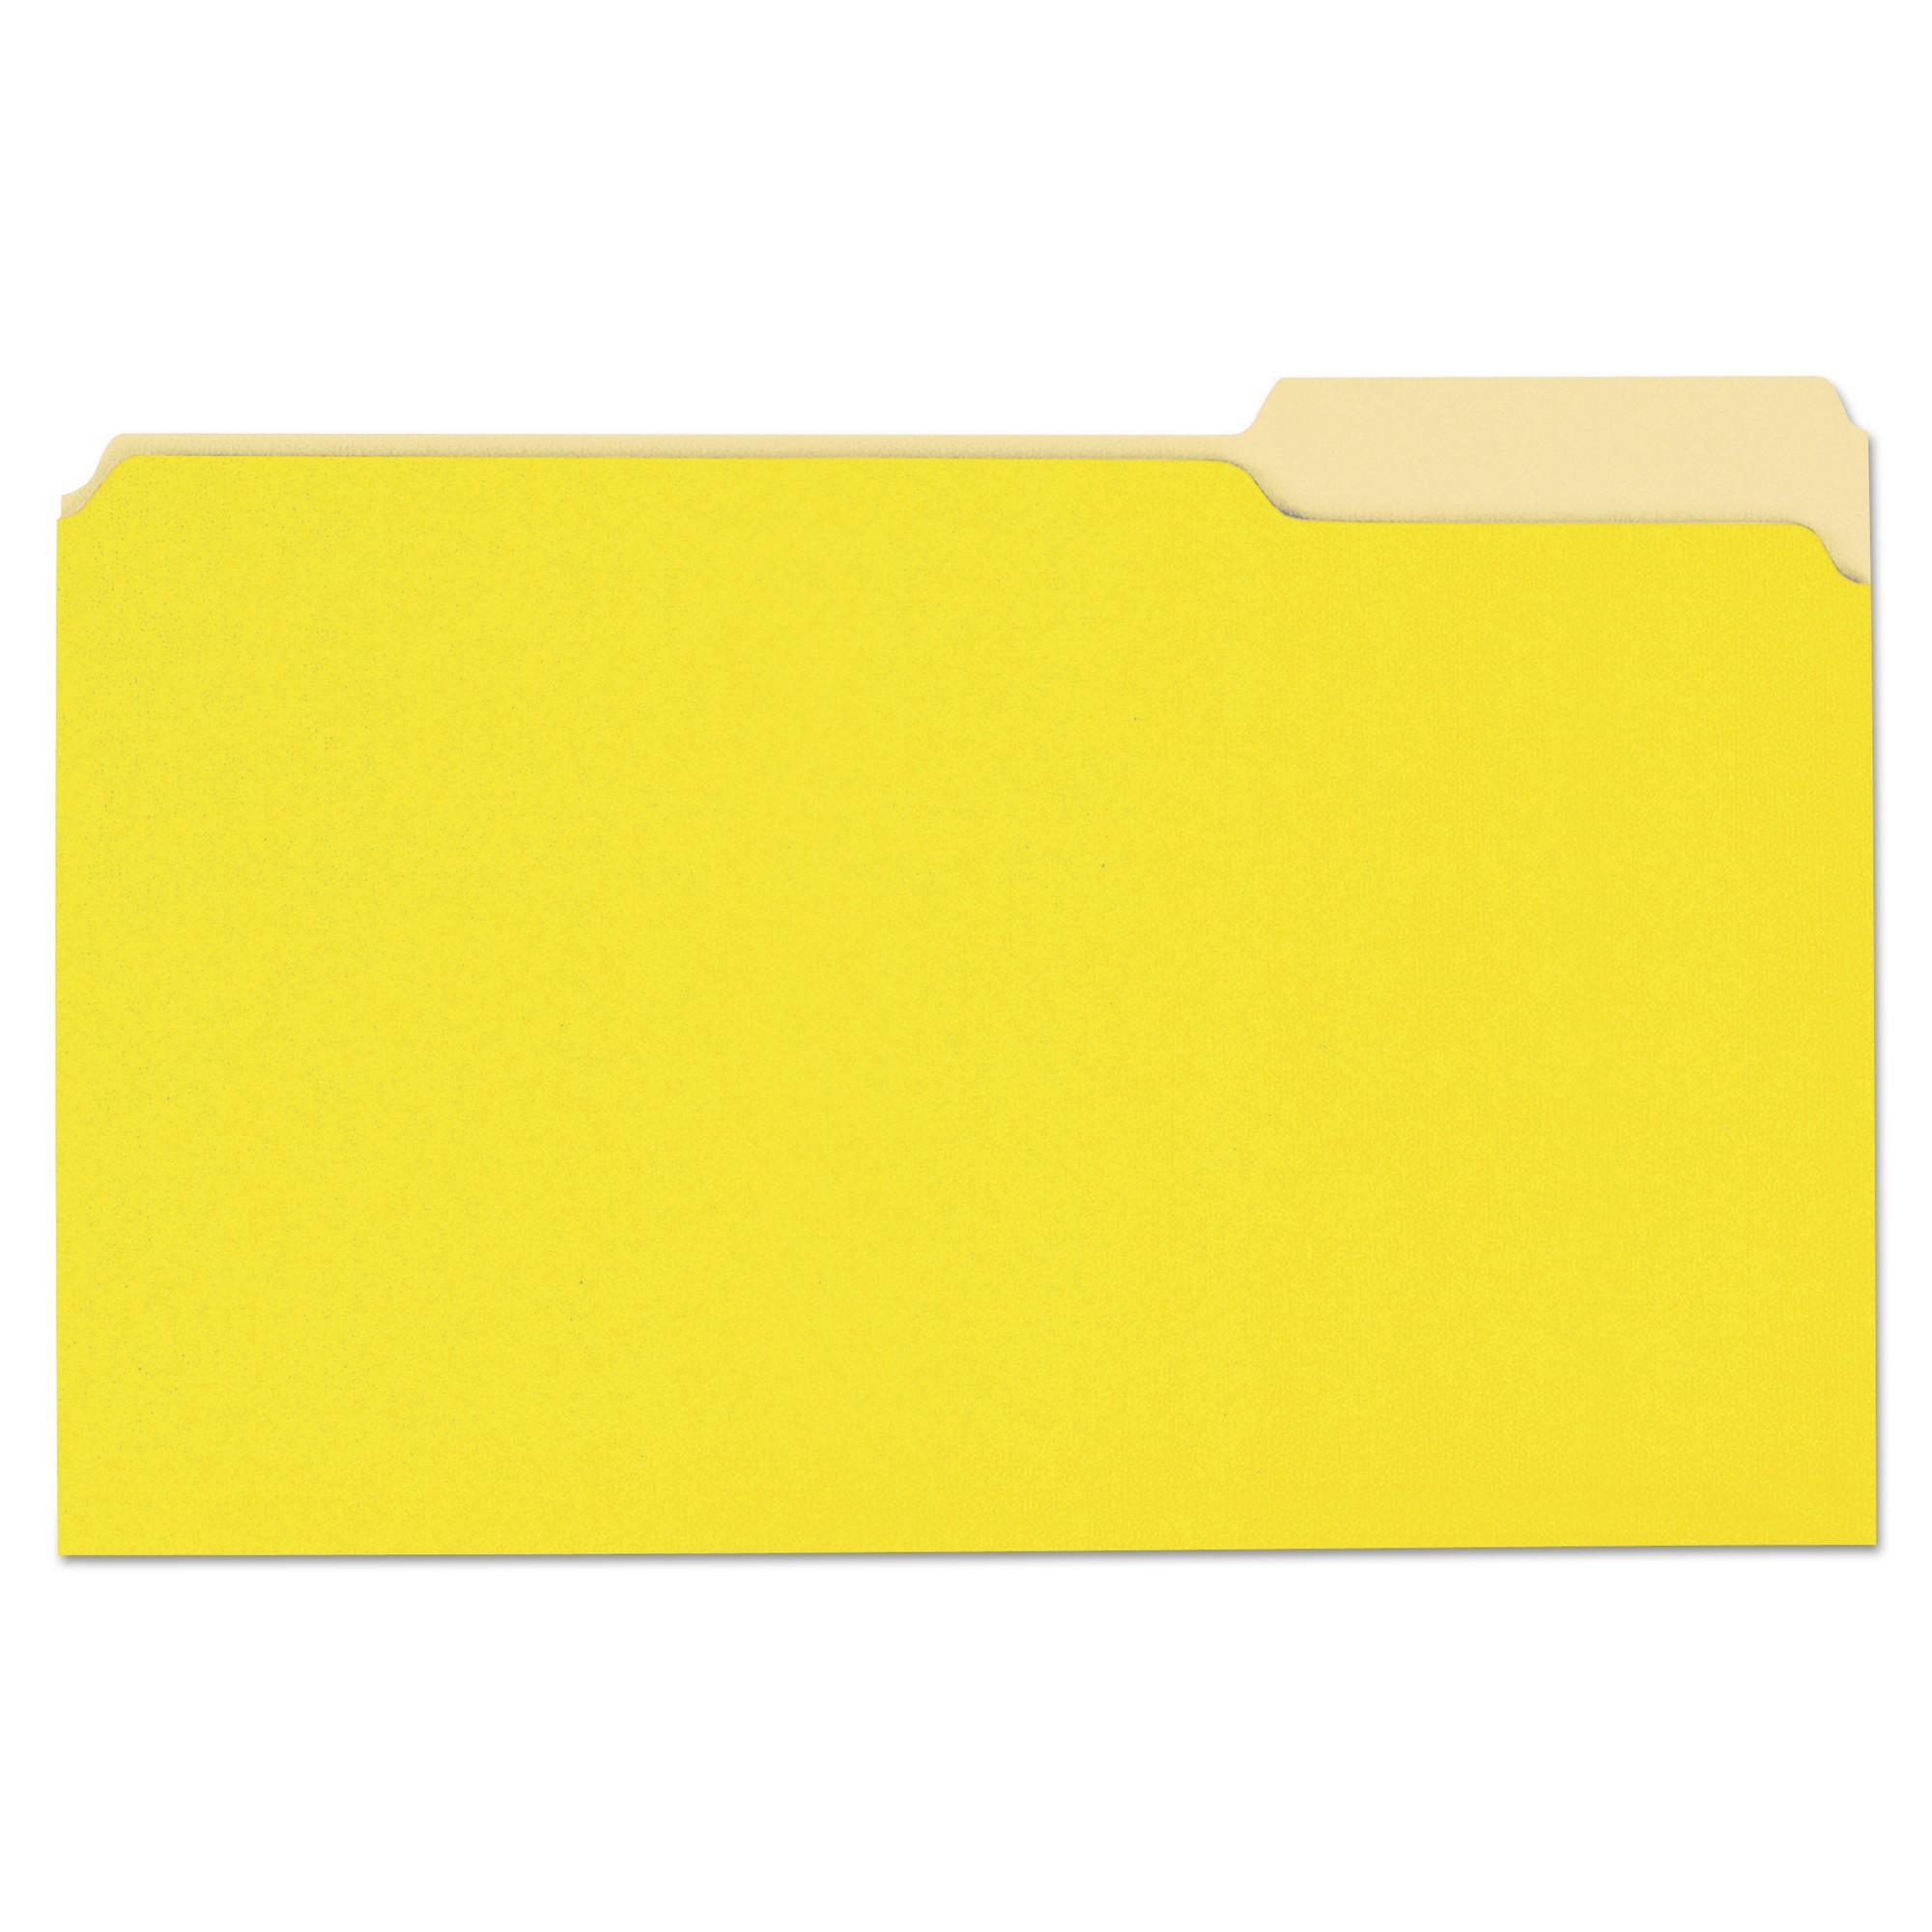 File Folders, 1/3 Cut One-Ply Top Tab, Legal, Yellow/Light Yellow, 100/Box